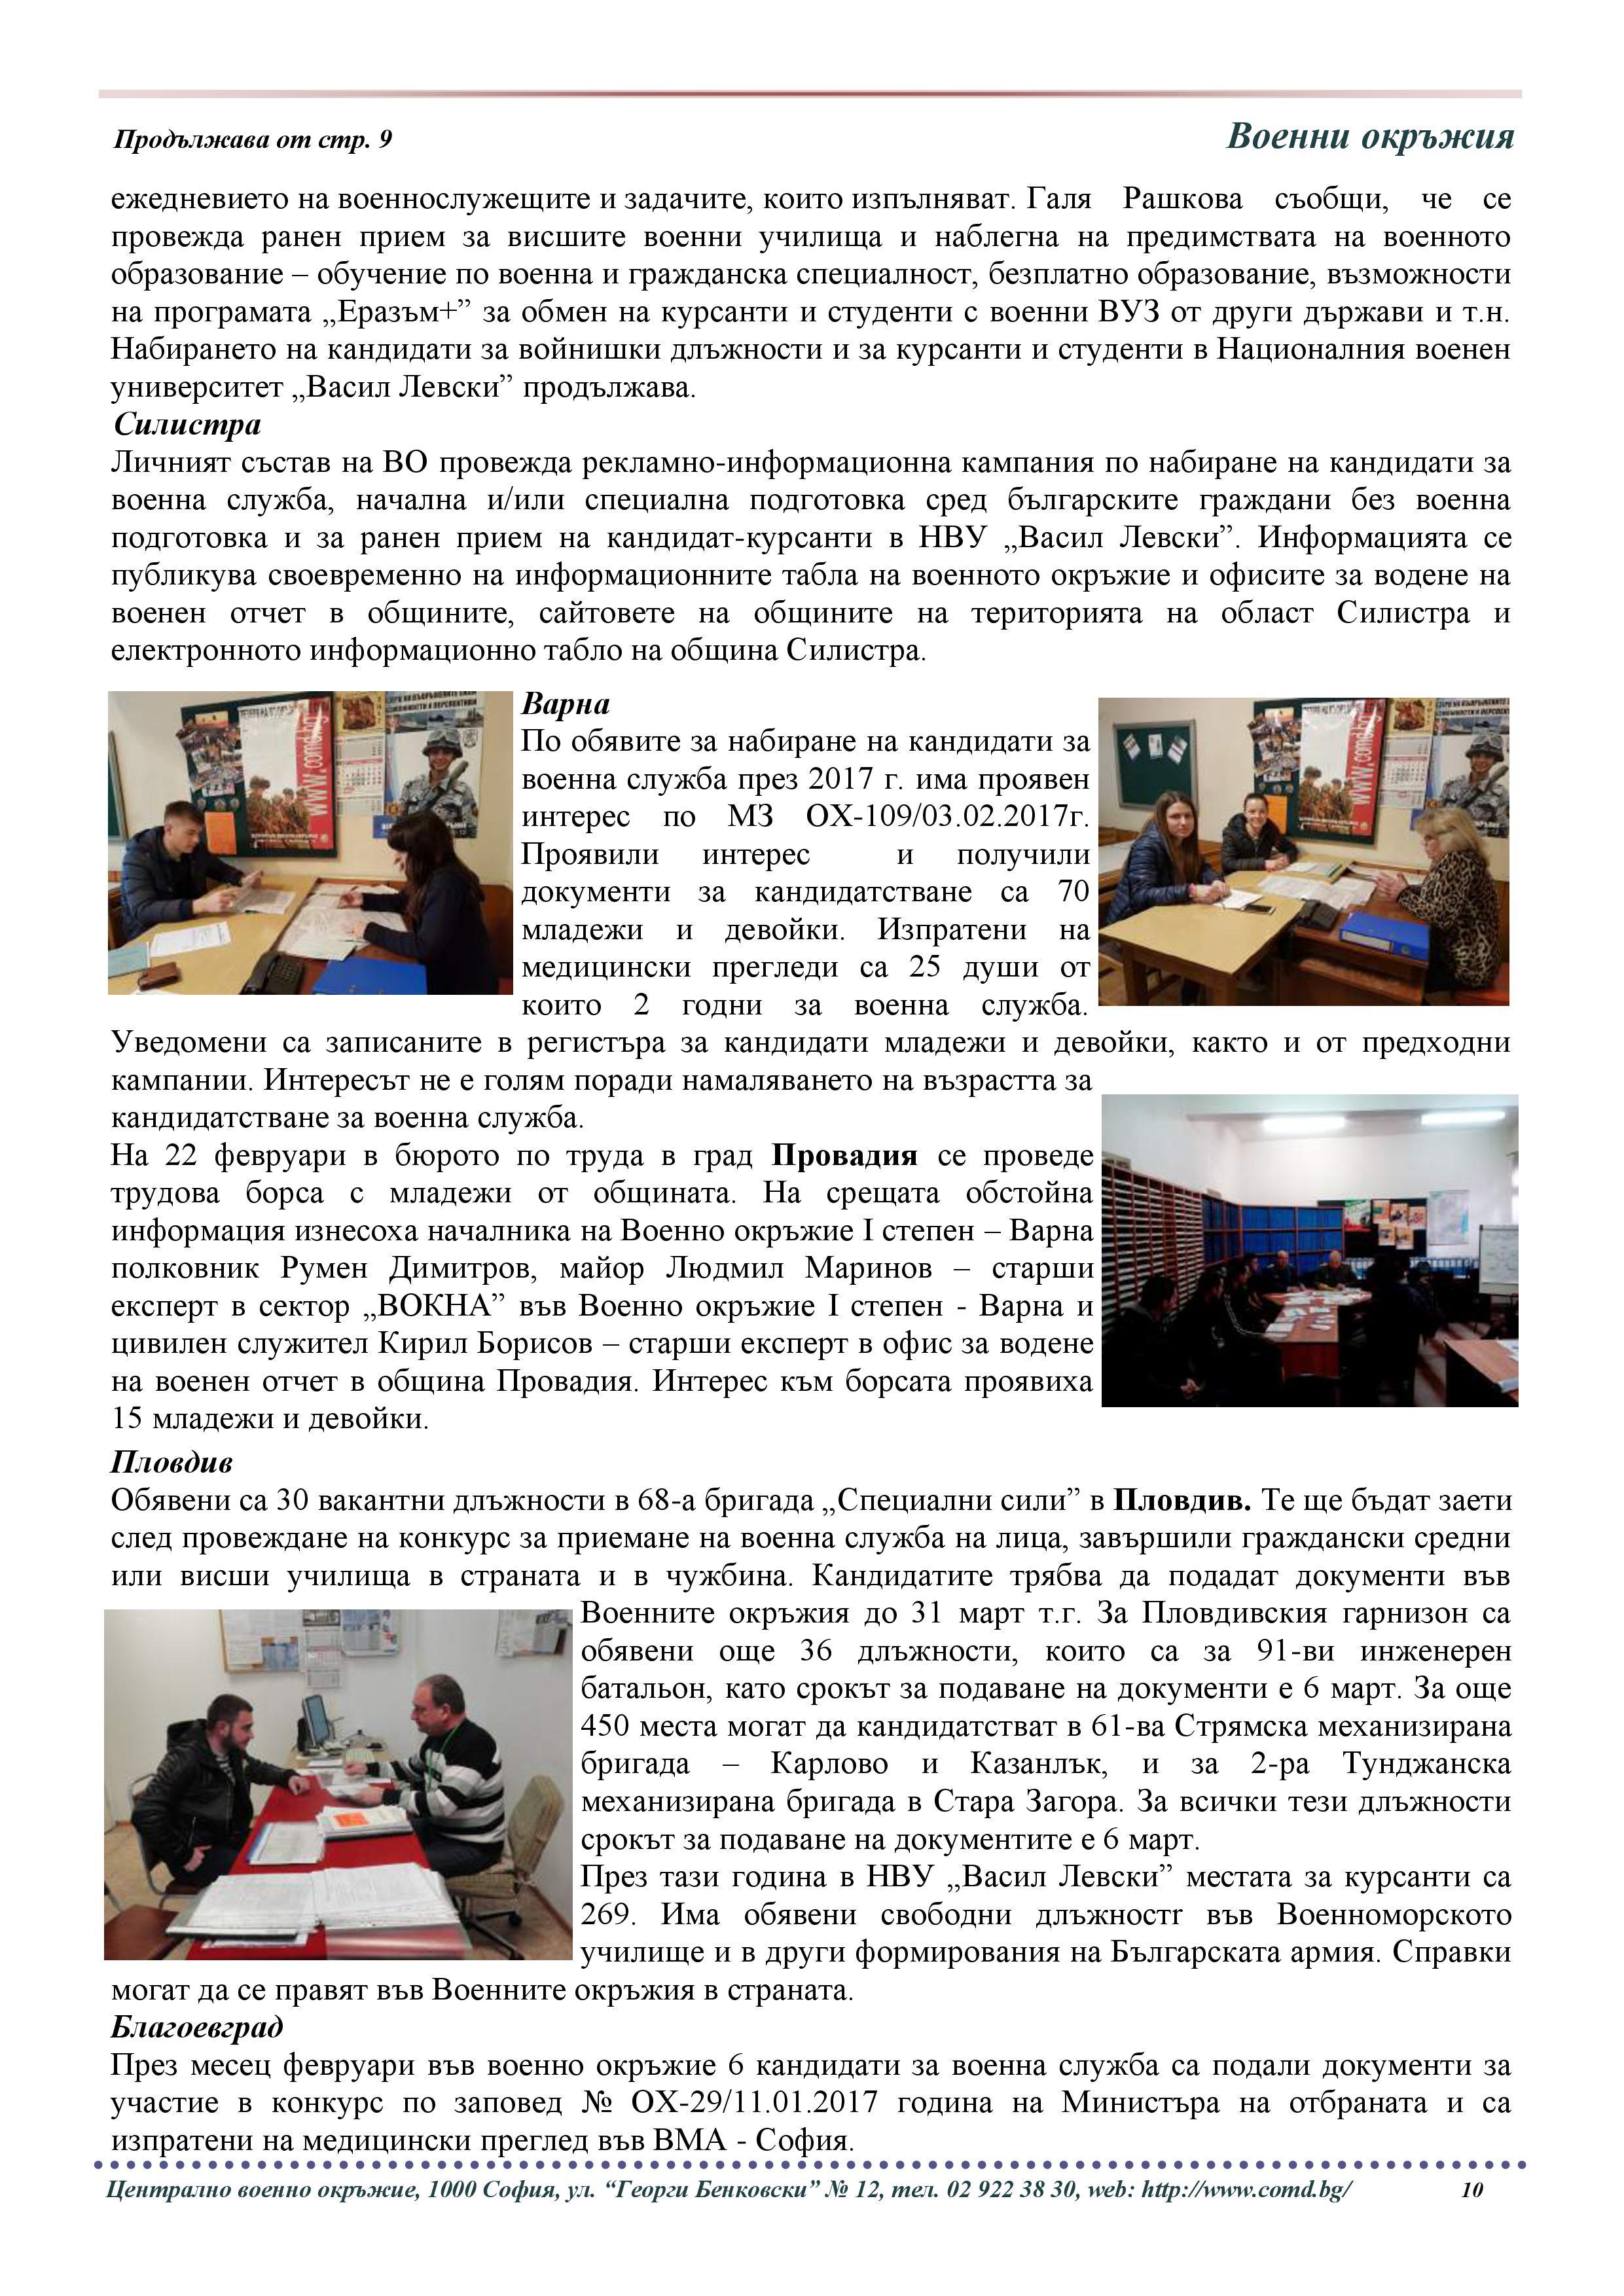 http://armymedia.bg/wp-content/uploads/2015/06/IB_2_2017g.compressed-za-izpra6tane-22.03.2017.page10.jpg